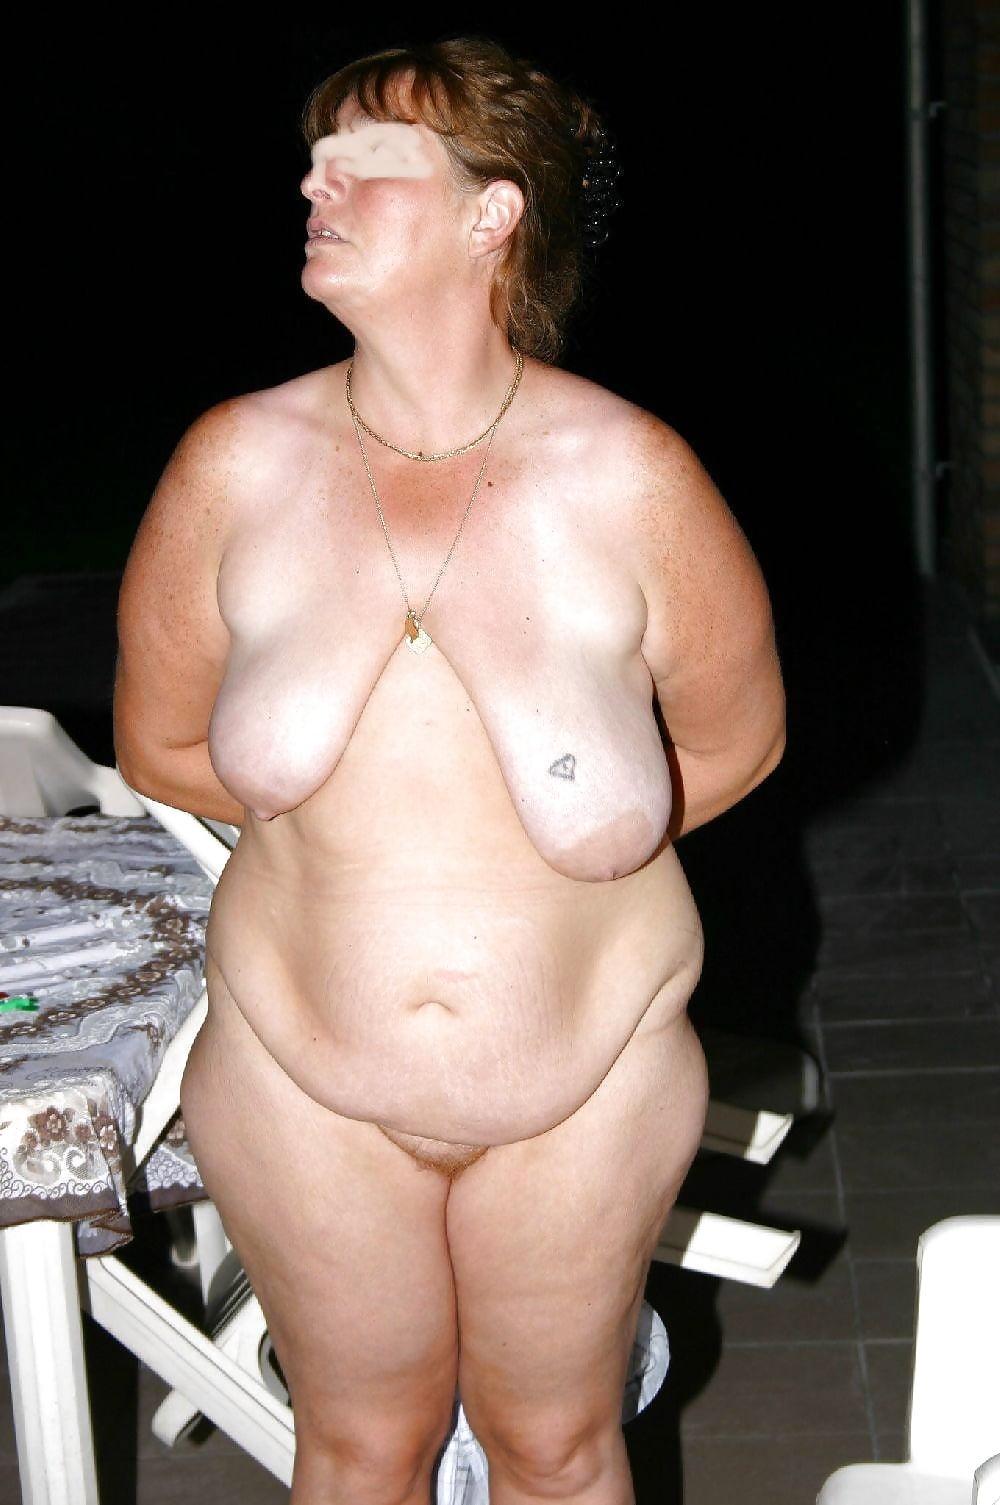 ugly-deformed-nude-girls-nude-girl-cotton-panties